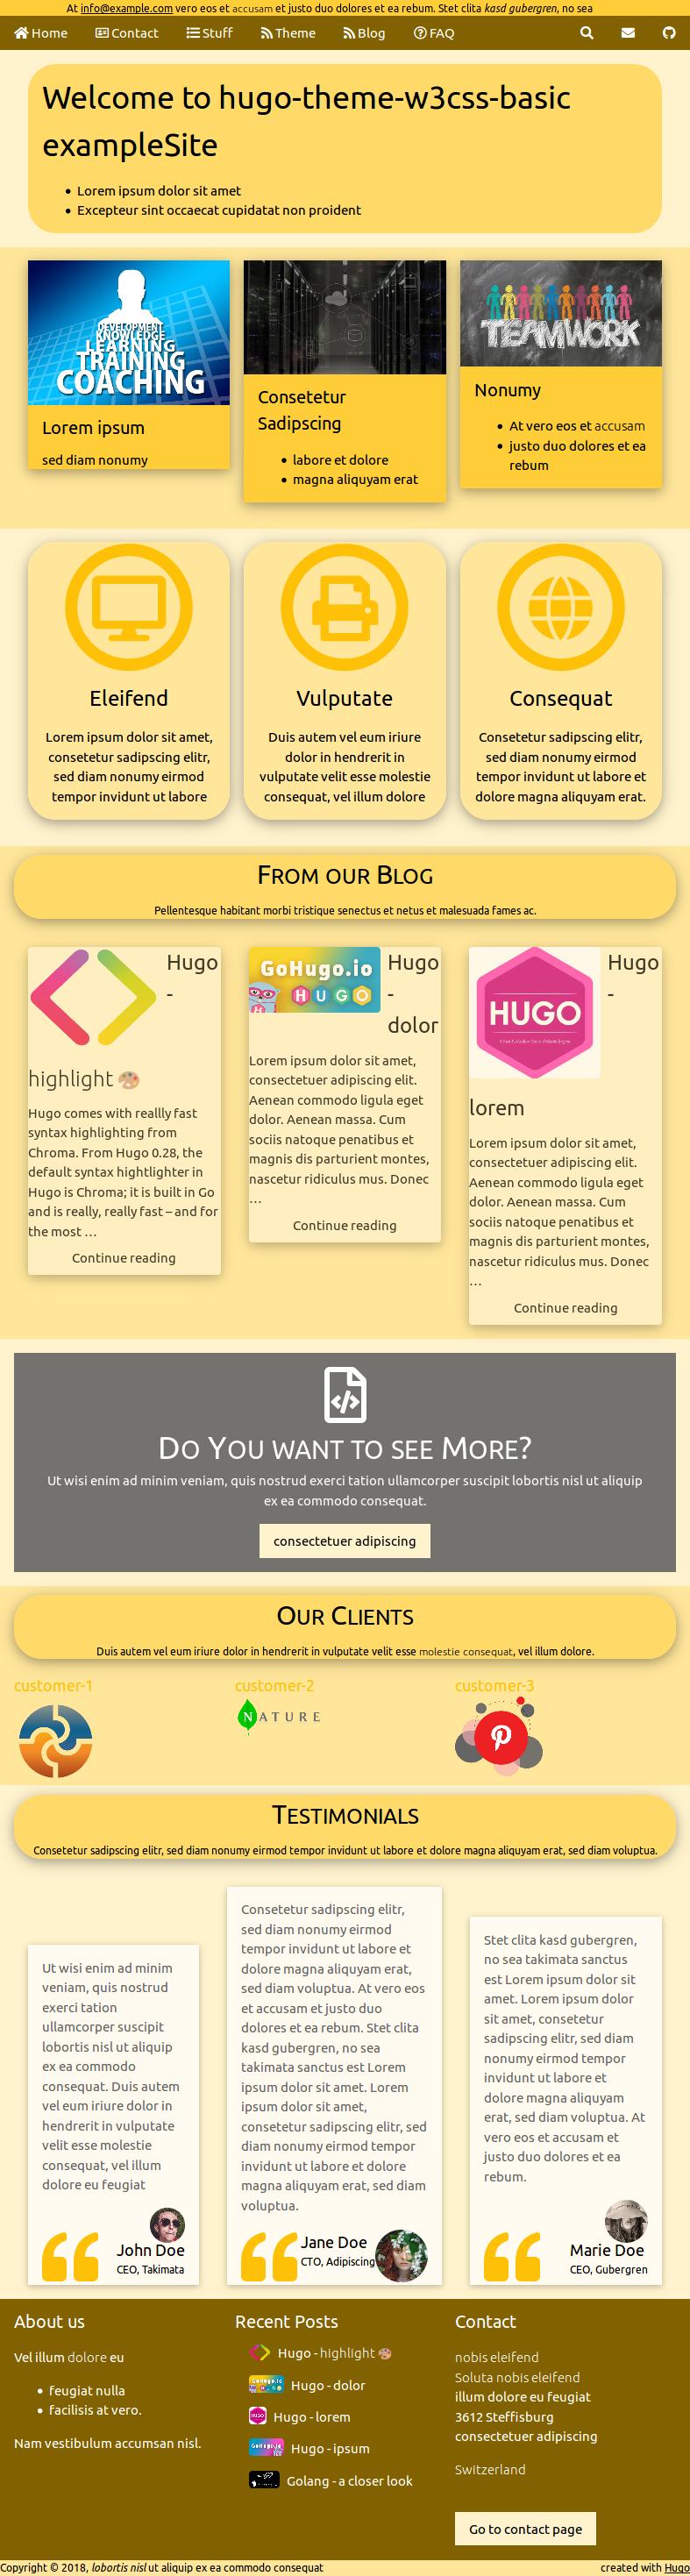 Hugo Theme W3css Basic | Hugo Themes